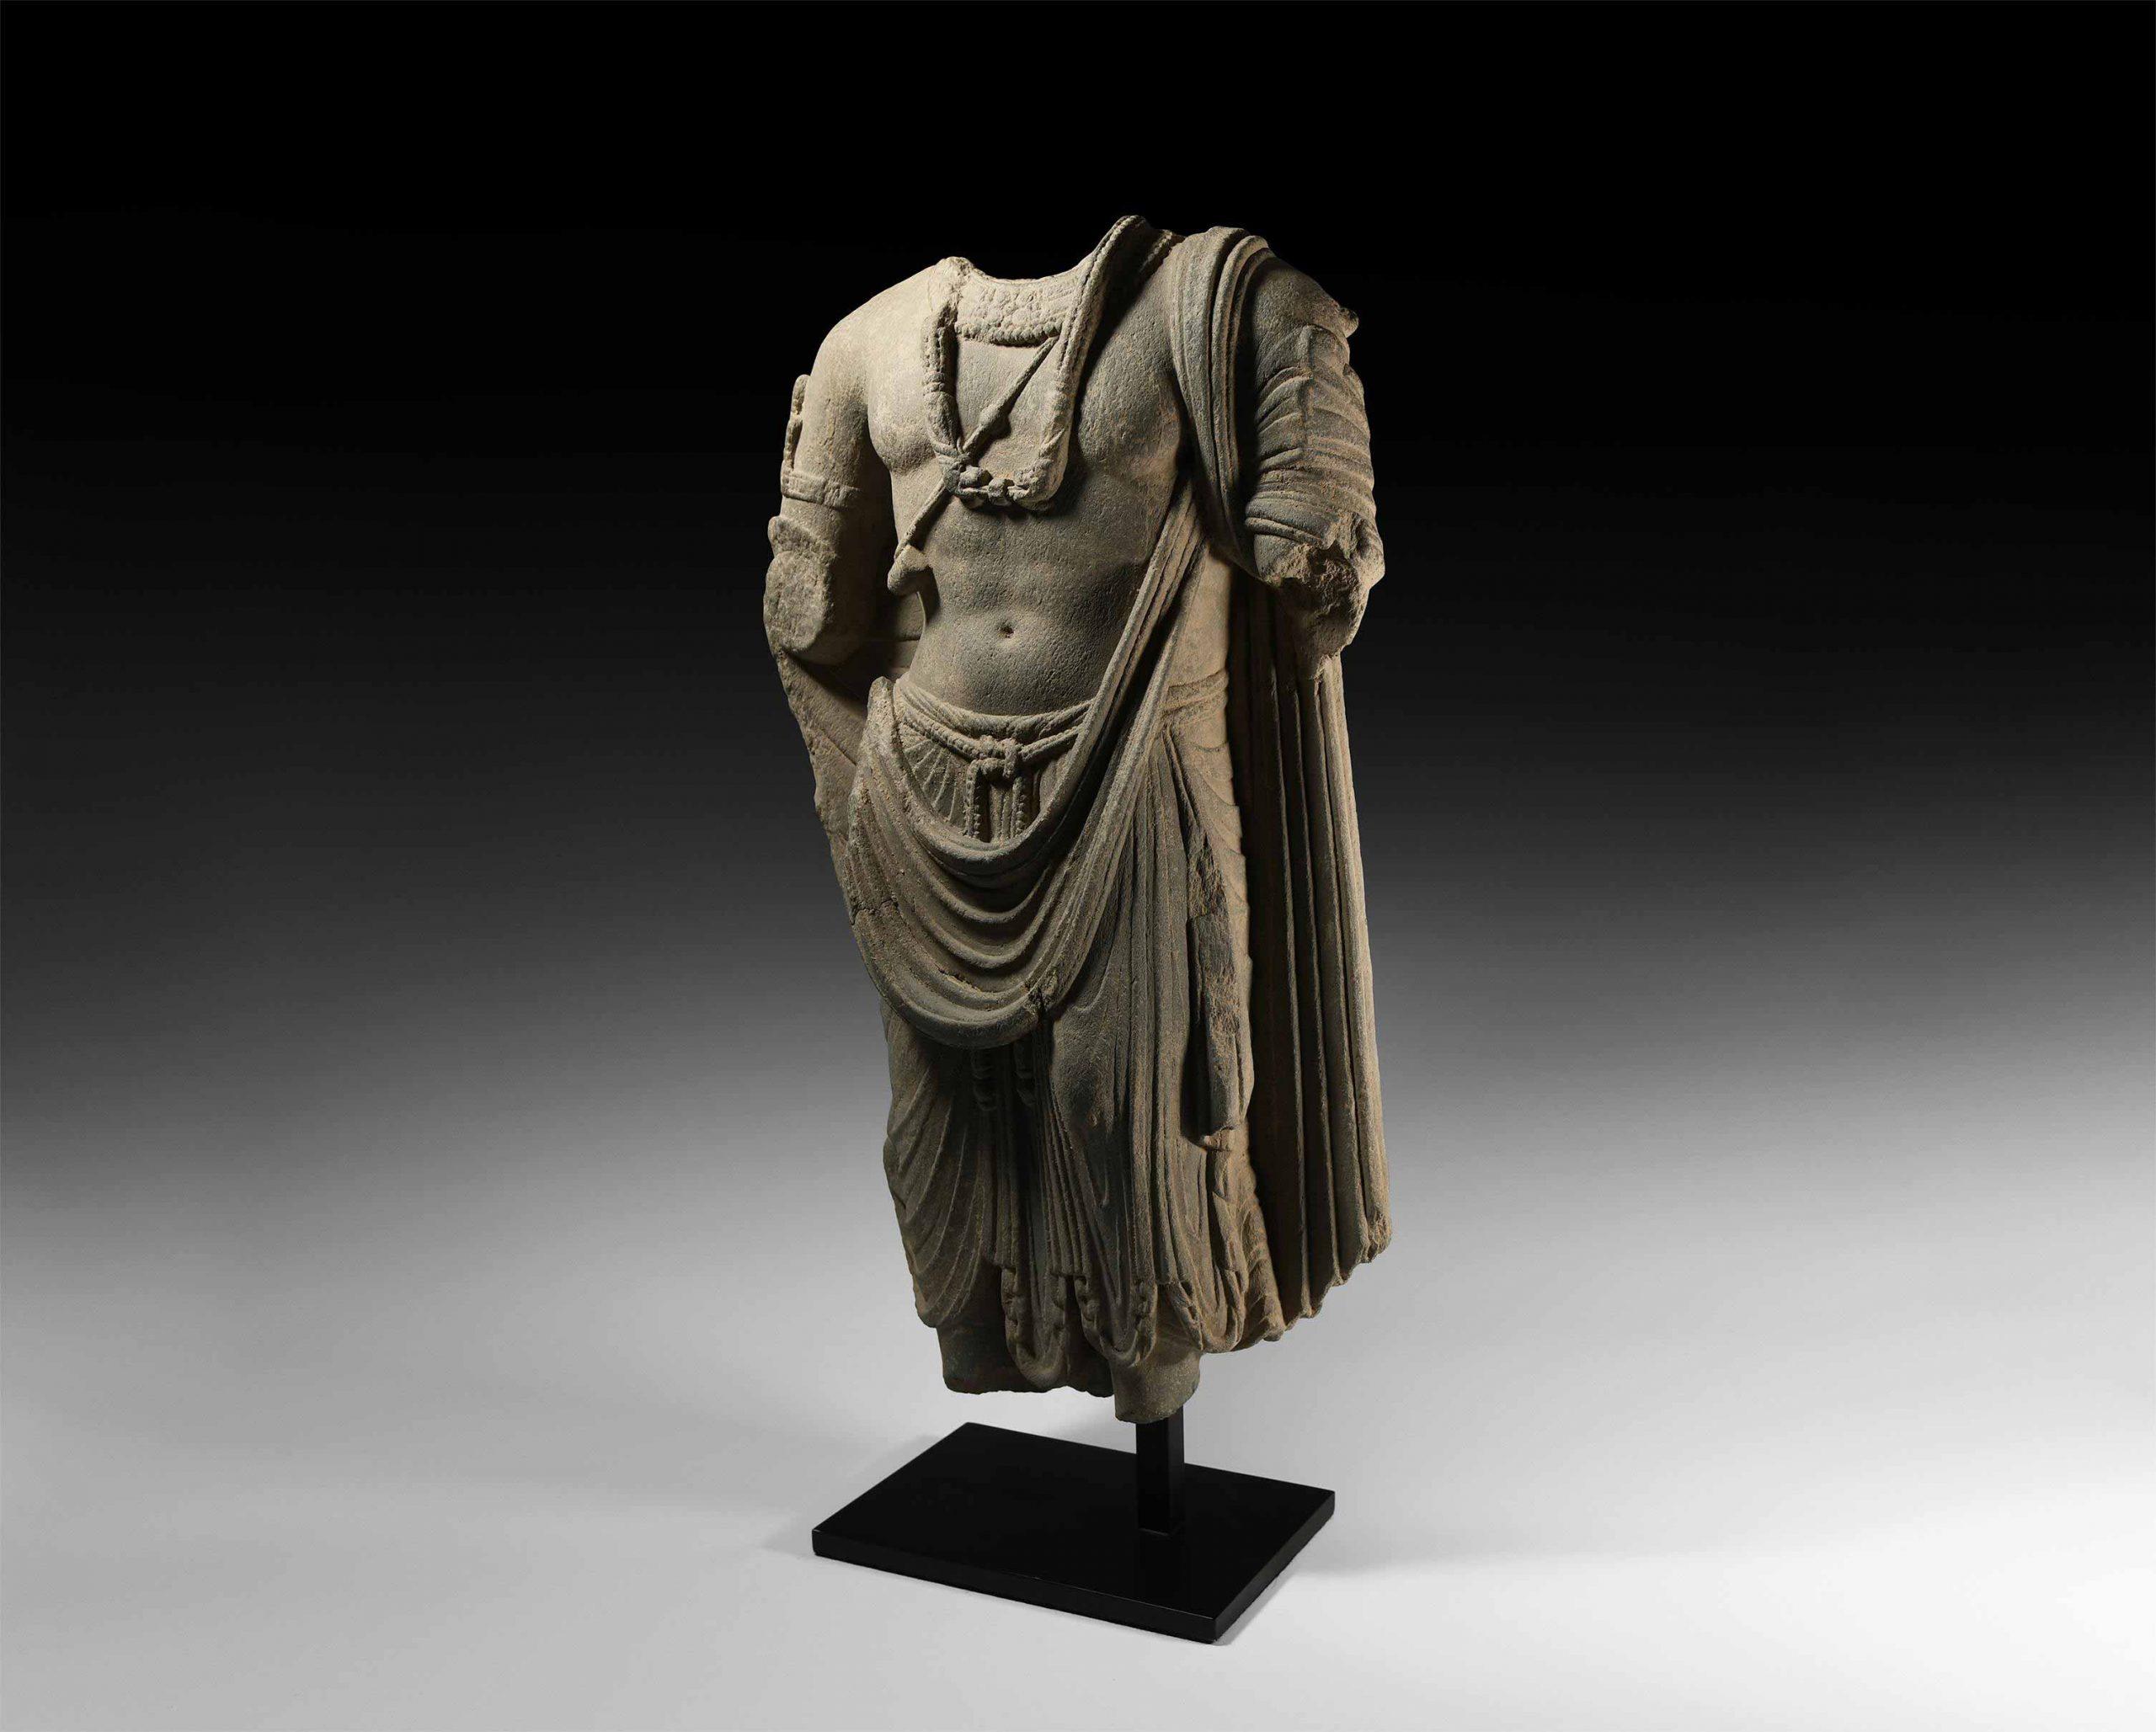 Gandharan Bodhisattva Statue Buddhist Asian Art Antique Sculptures